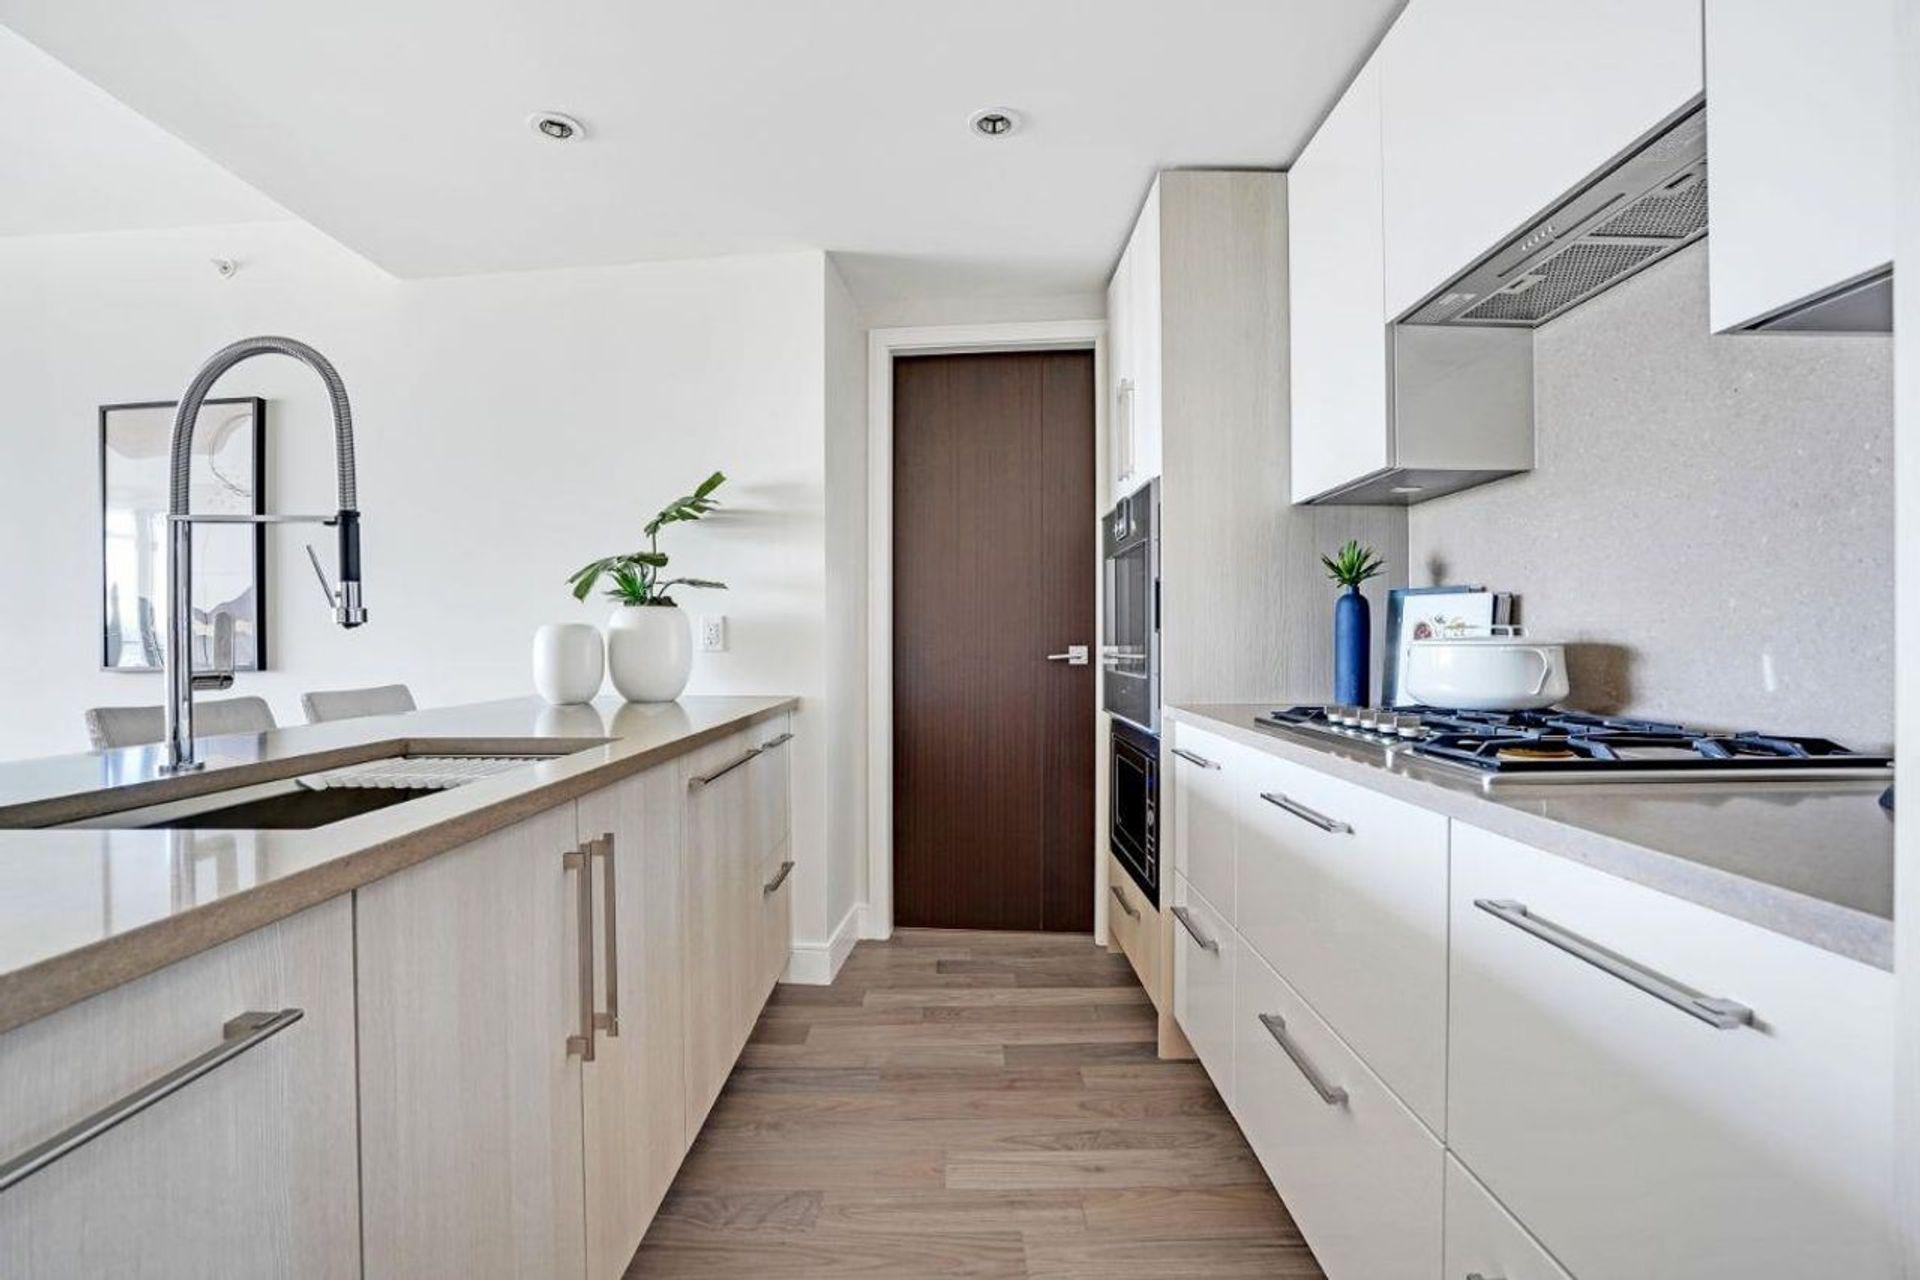 210-salter-street-queensborough-new-westminster-09 at 1007 - 210 Salter Street, Queensborough, New Westminster